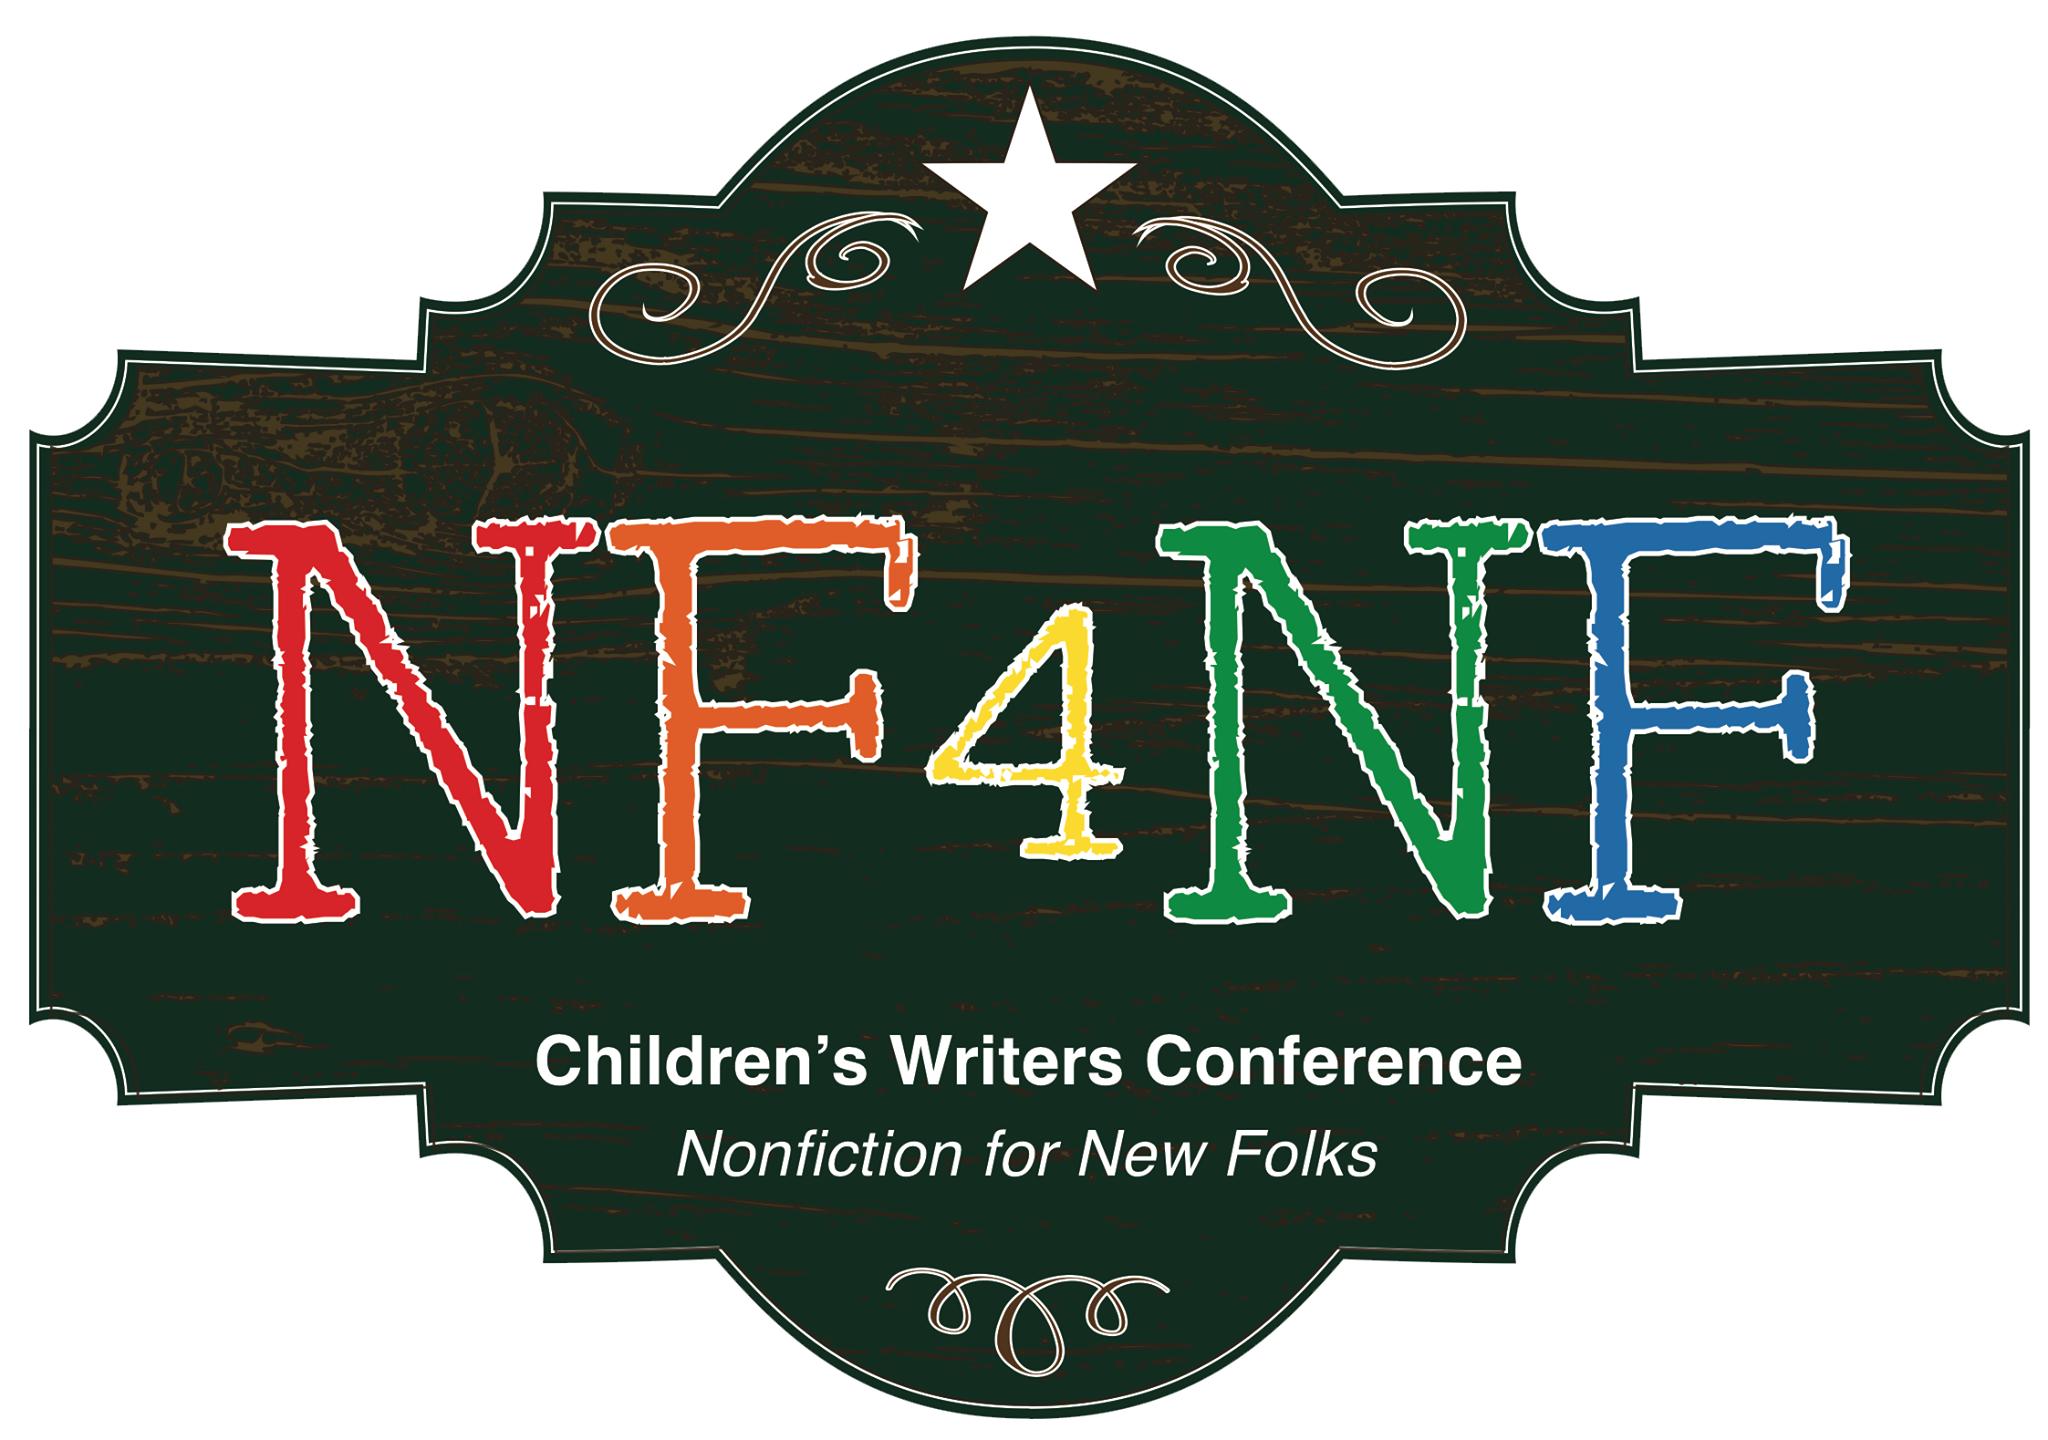 OCT. 9-12, Fredericksburg, TX